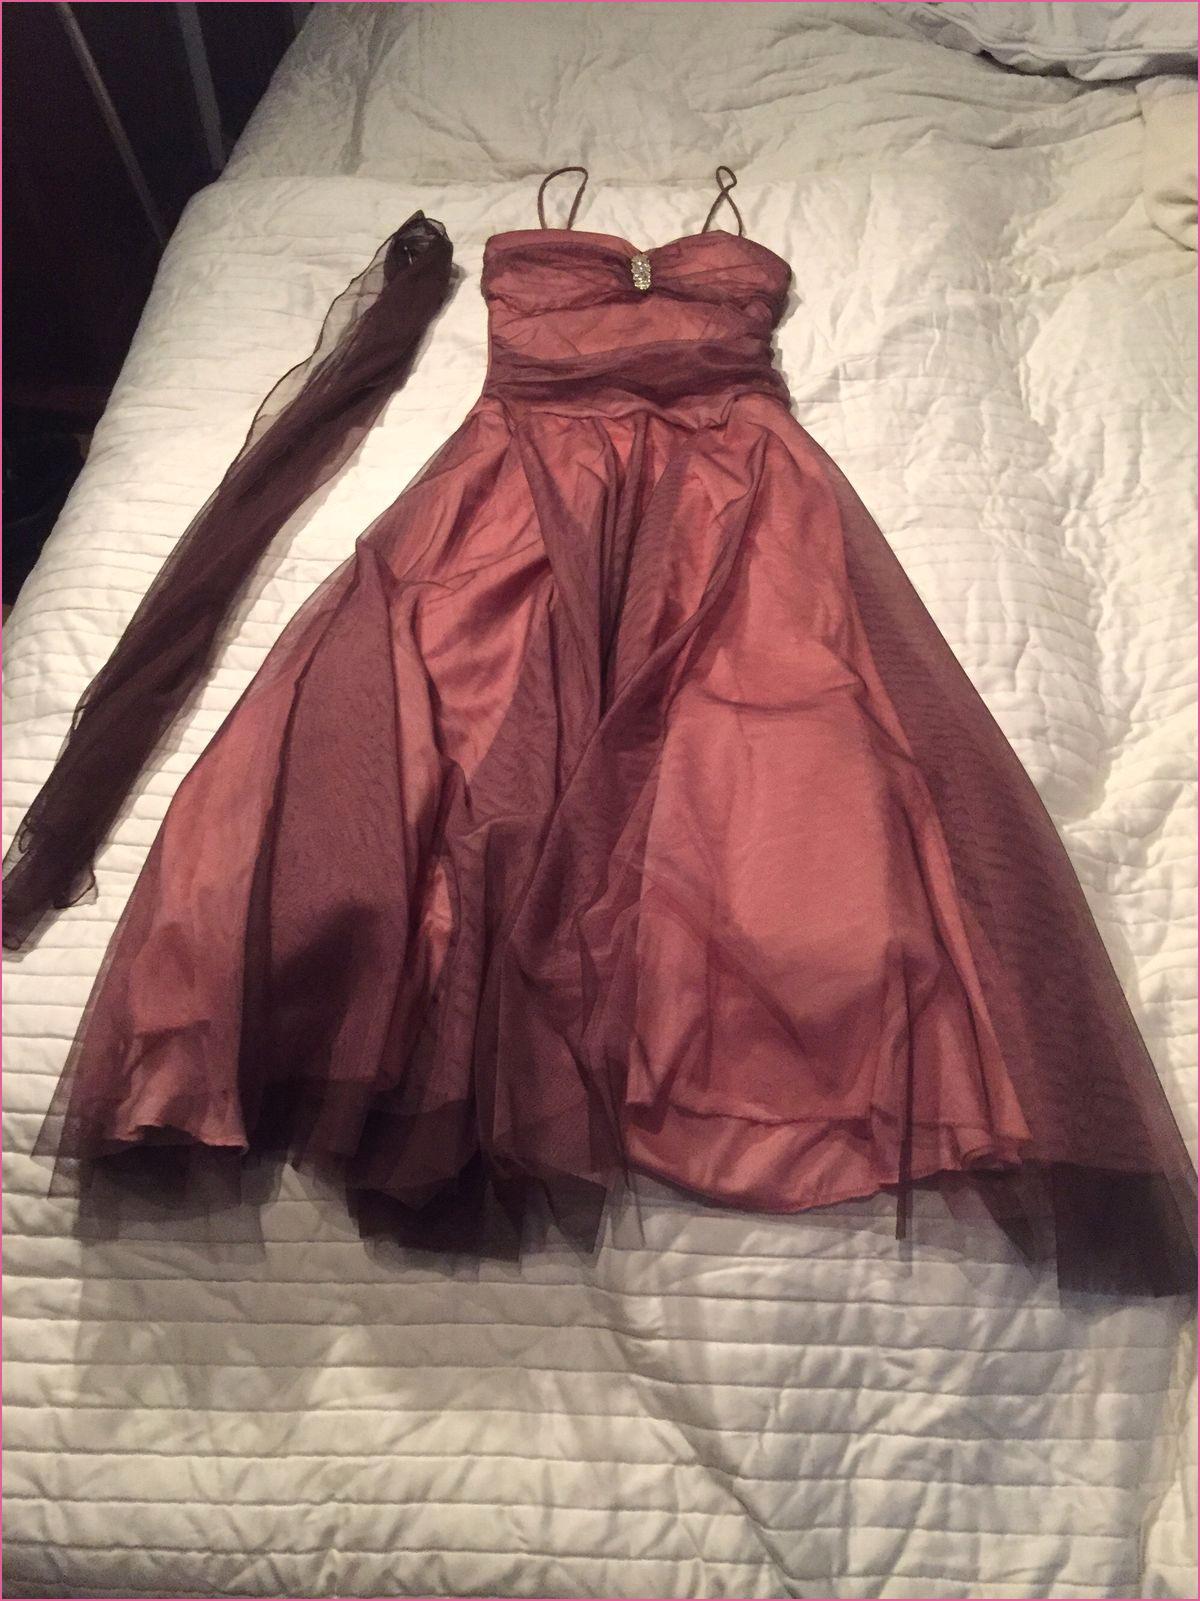 Schön Abendkleid Lang 34 VertriebFormal Fantastisch Abendkleid Lang 34 Spezialgebiet